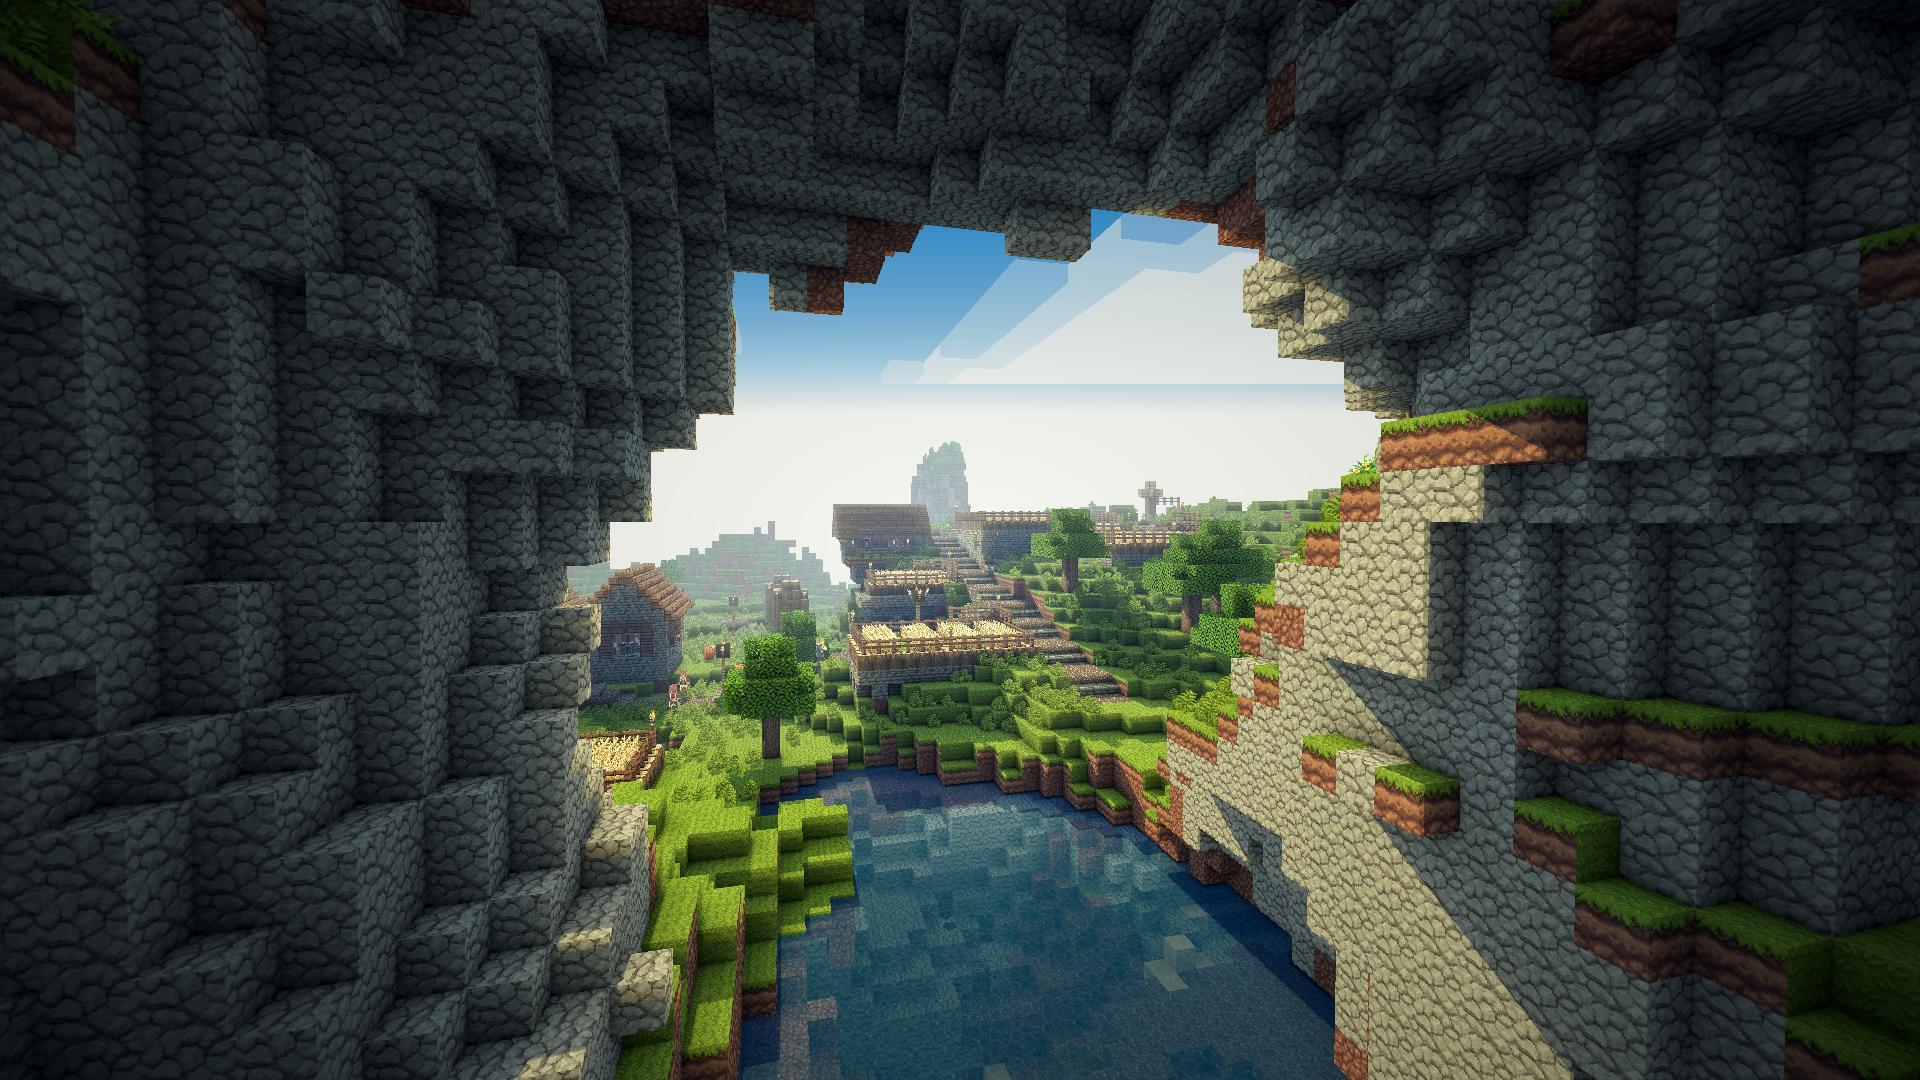 Minecraft Res: 1920x1080 HD / Size:327kb. Views: 683162